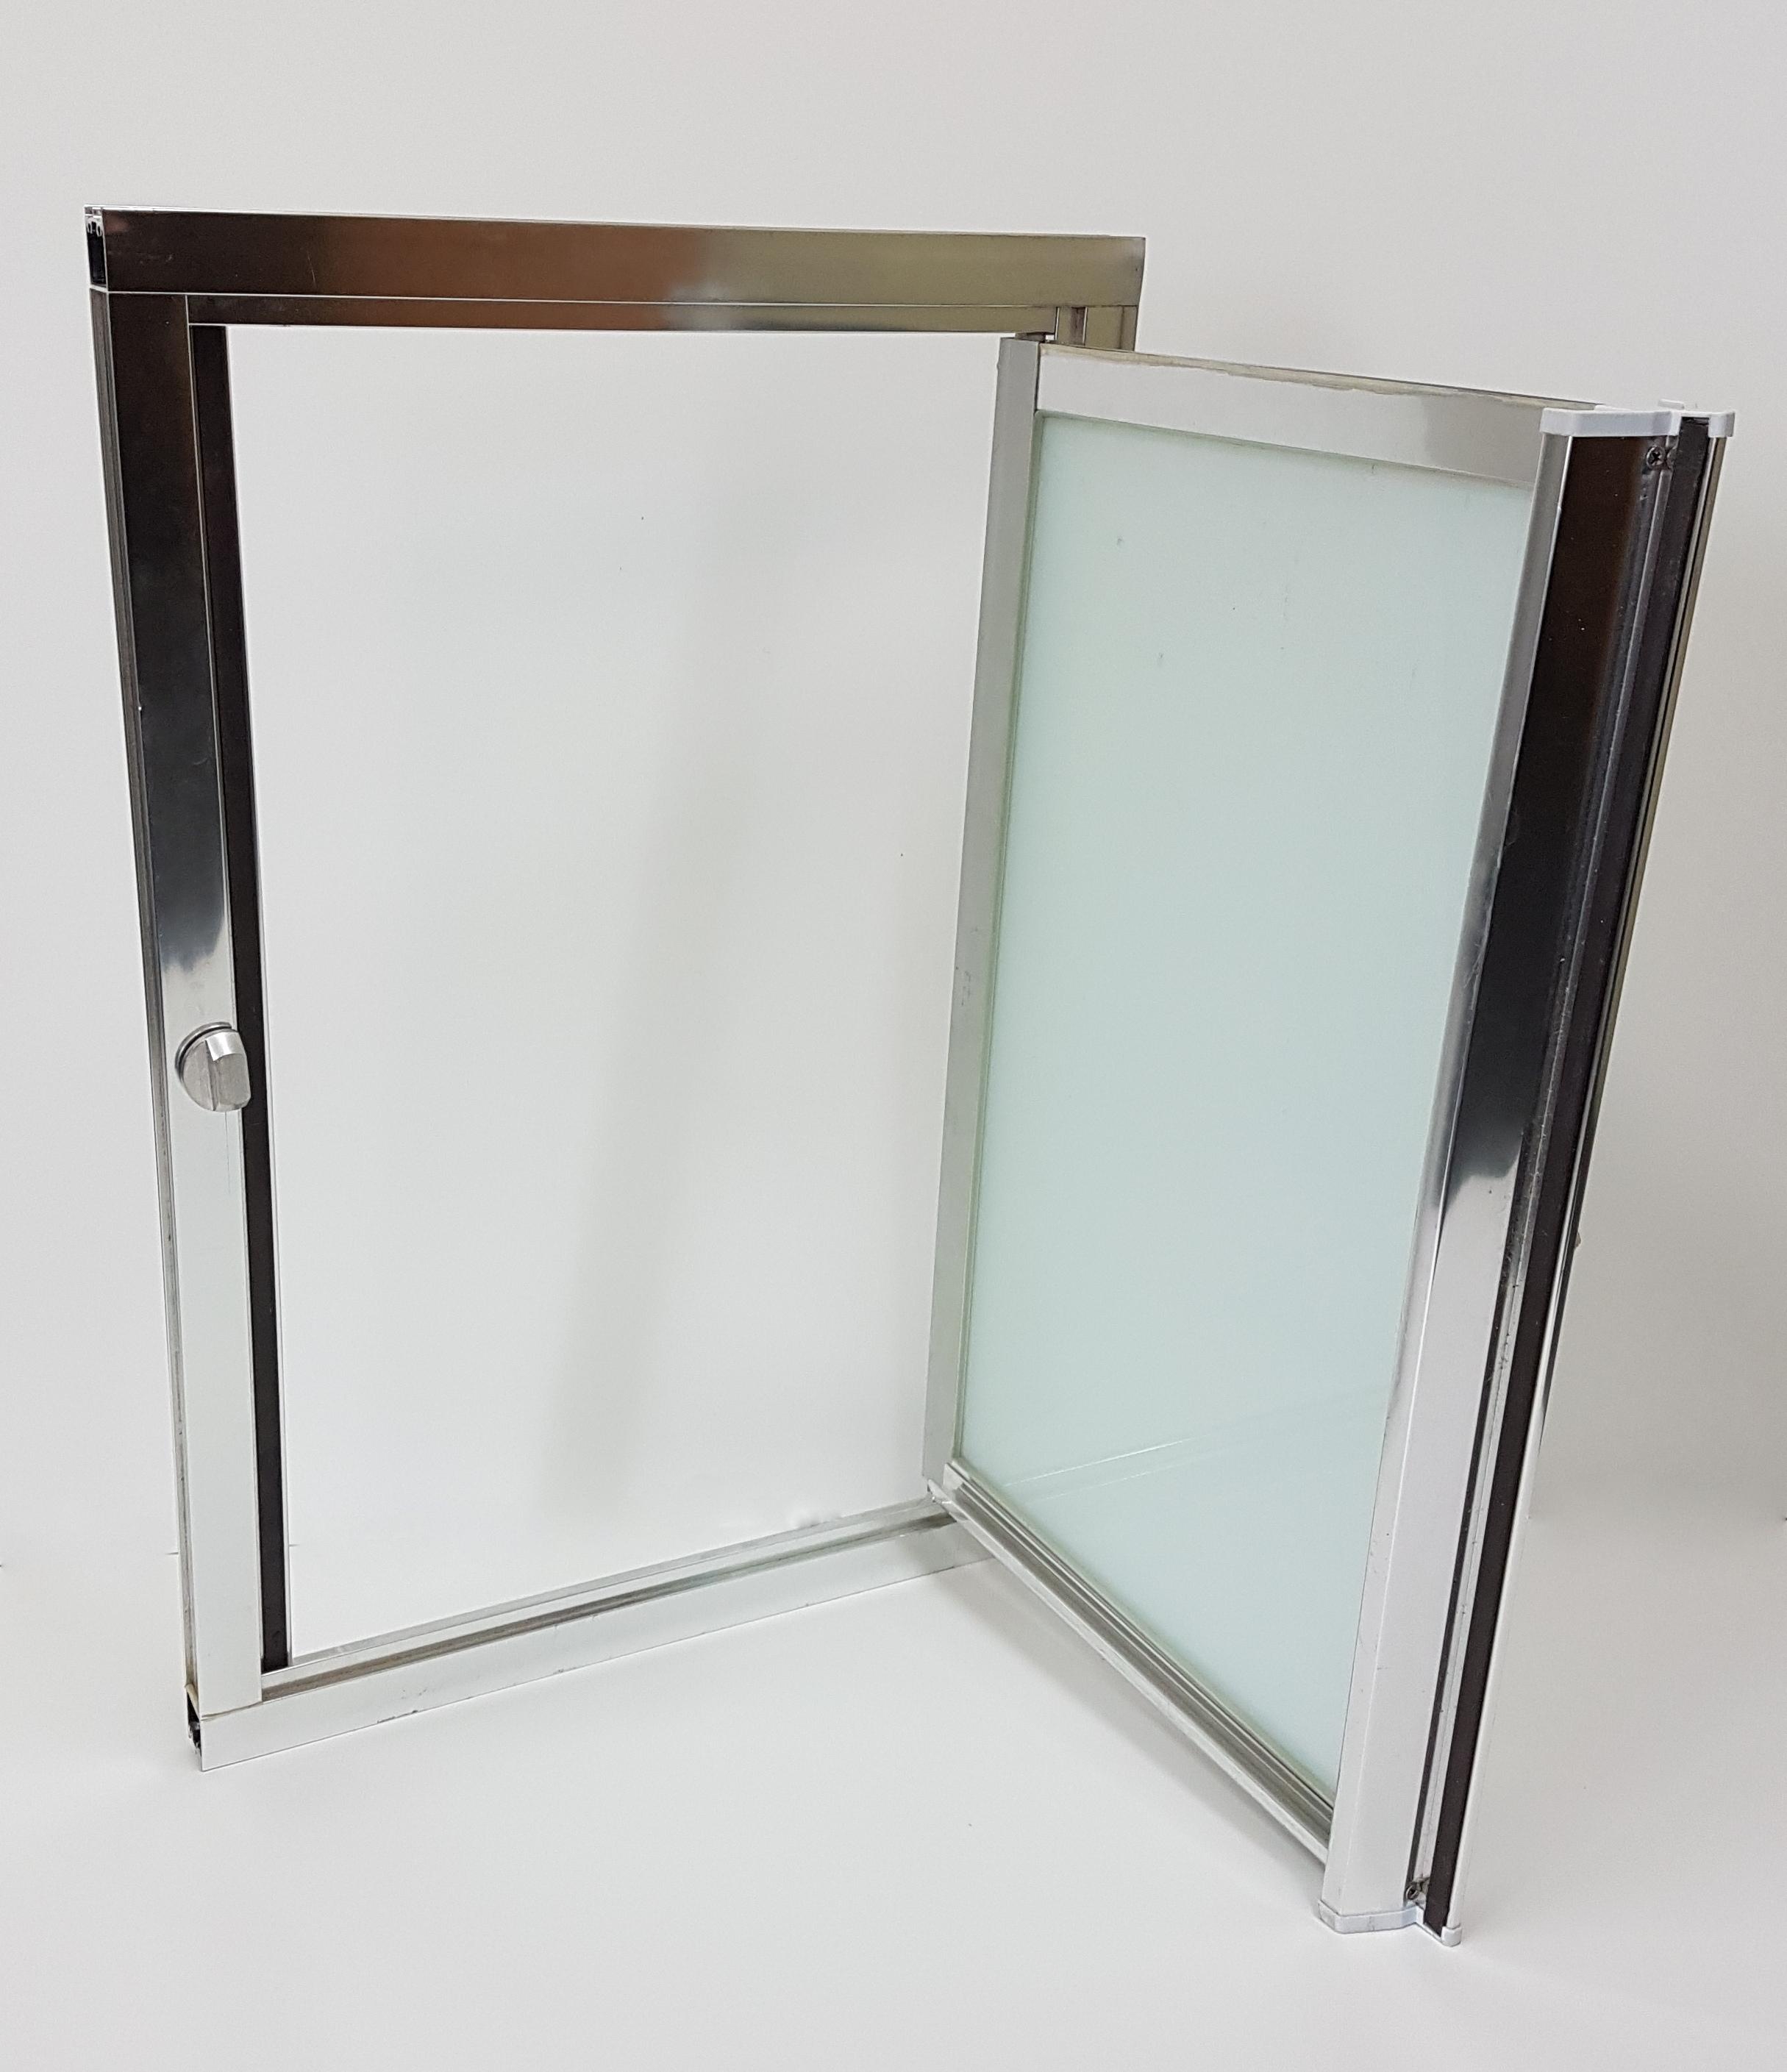 Shower Screens Nbc Products Pty Ltd